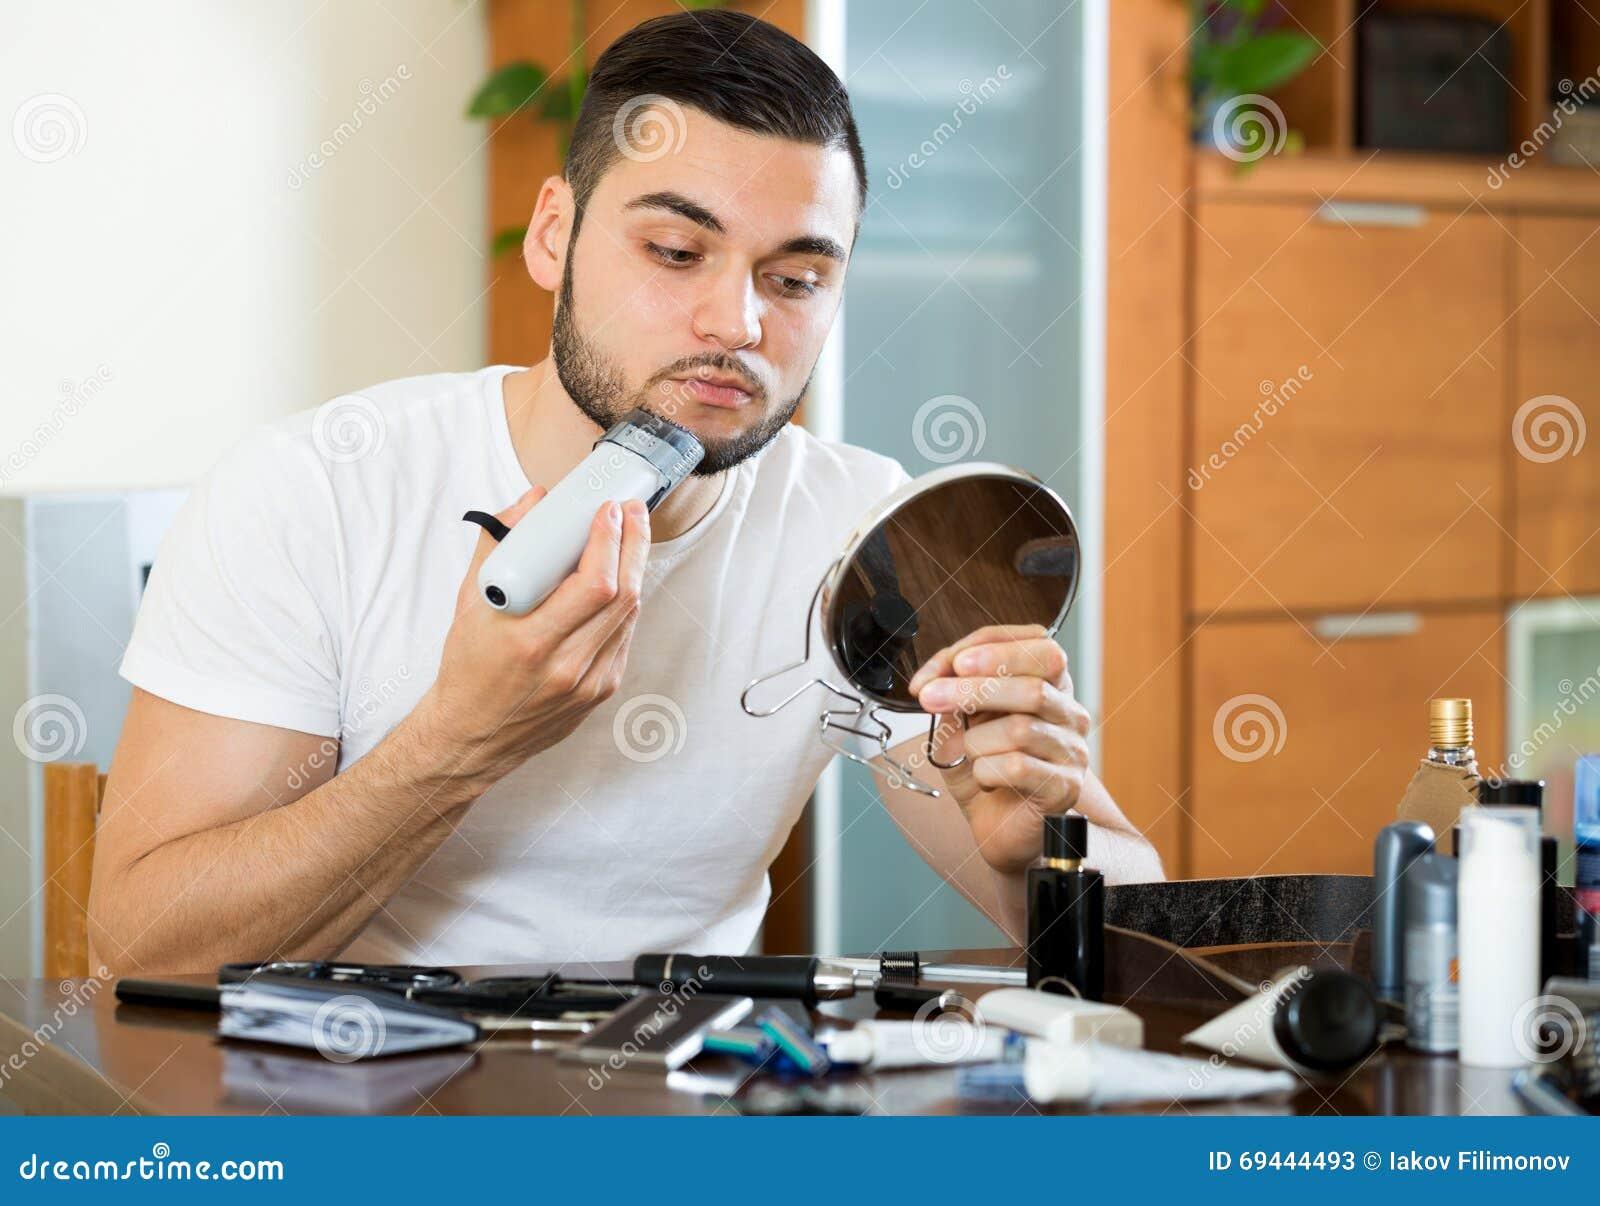 rasage de la barbe avec un trimmer photo stock image 69444493. Black Bedroom Furniture Sets. Home Design Ideas